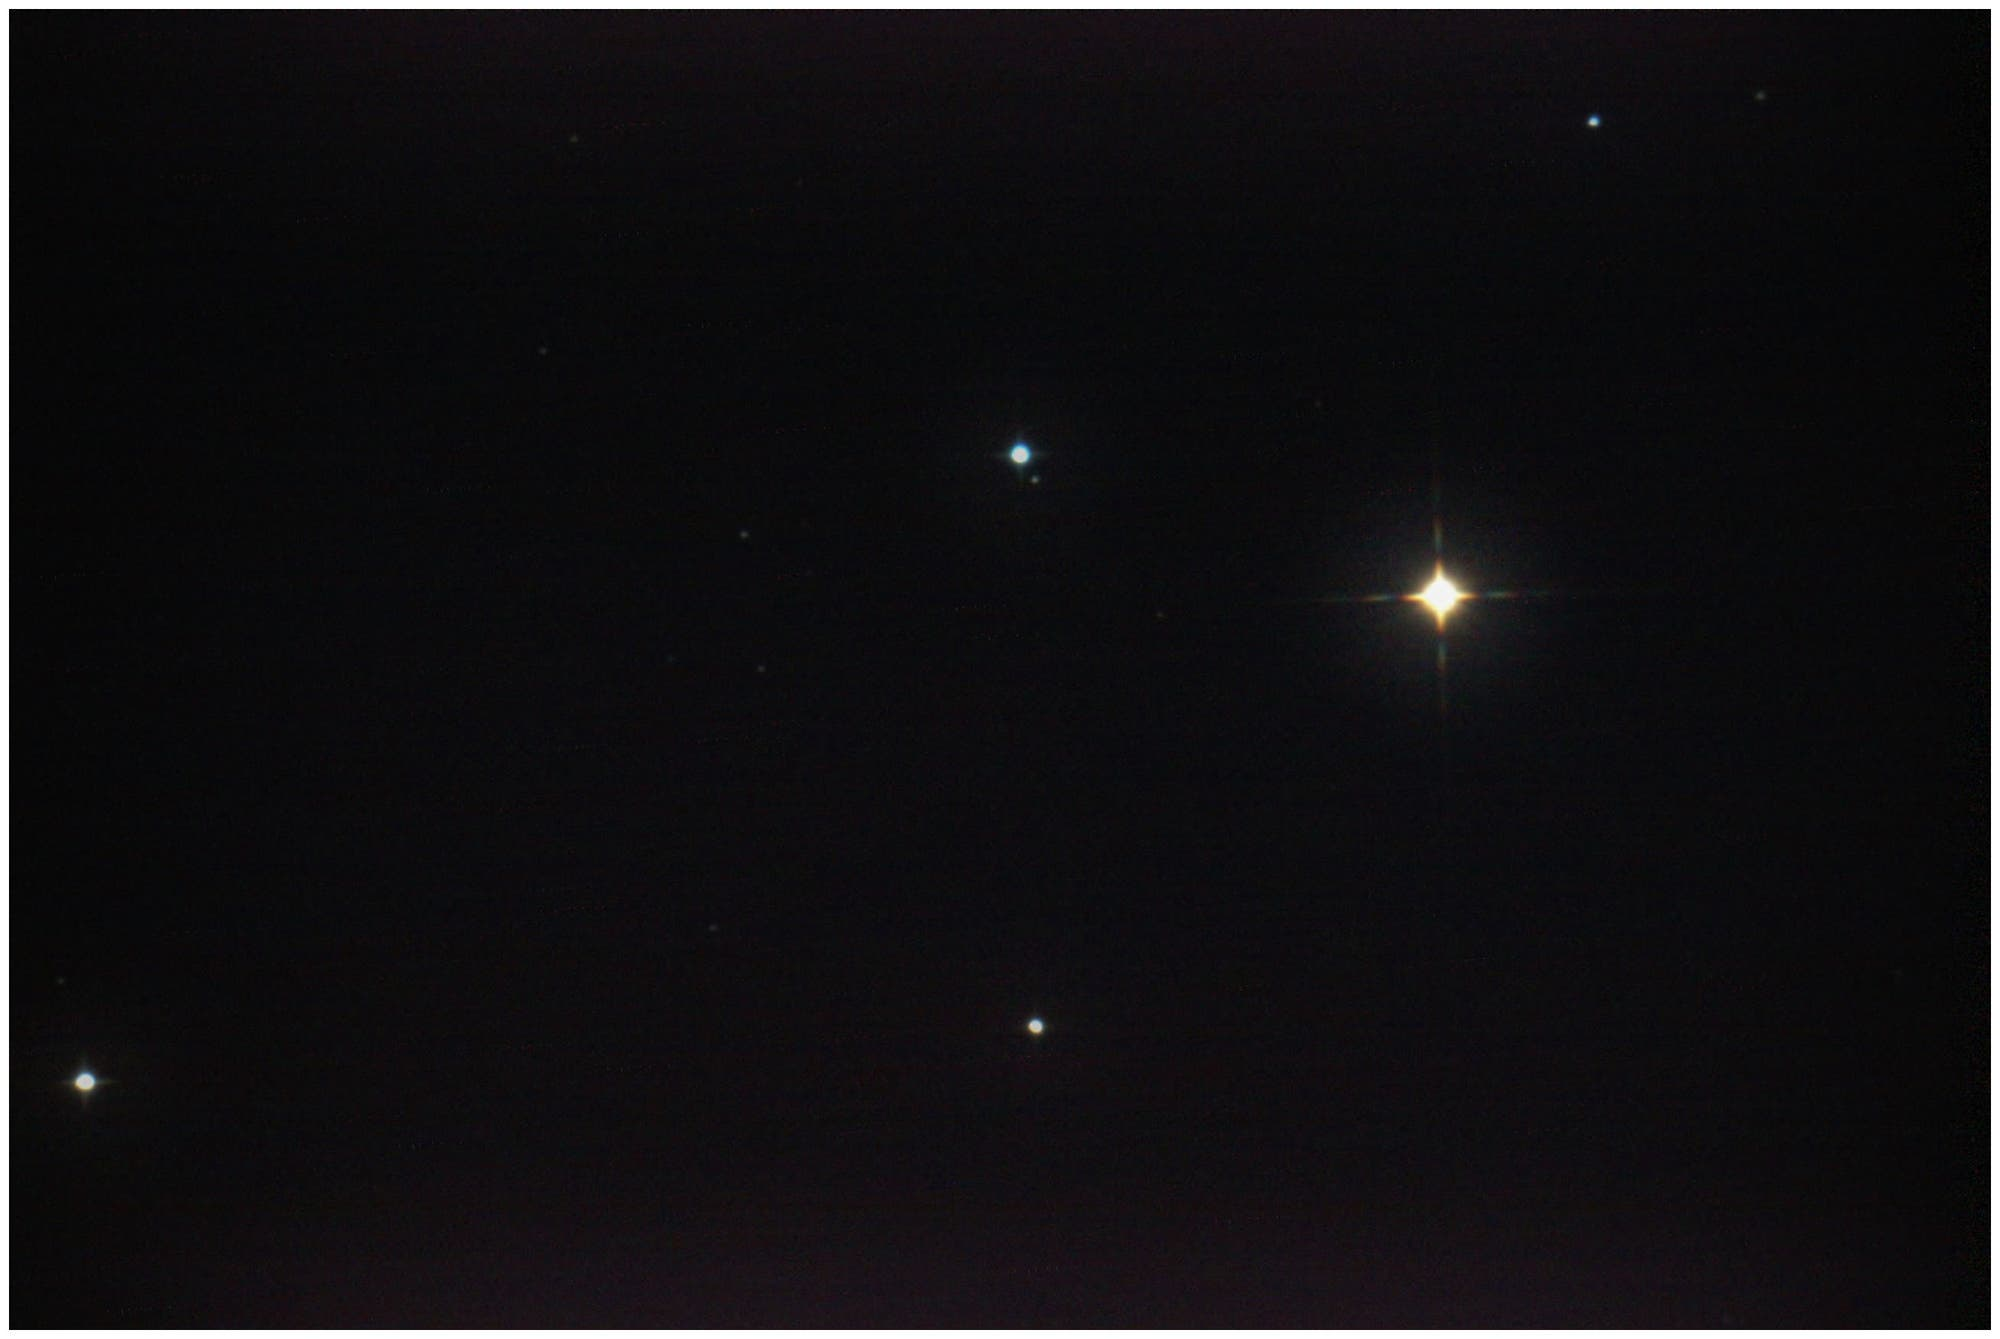 Planet Neptun bei Phi Aquarii